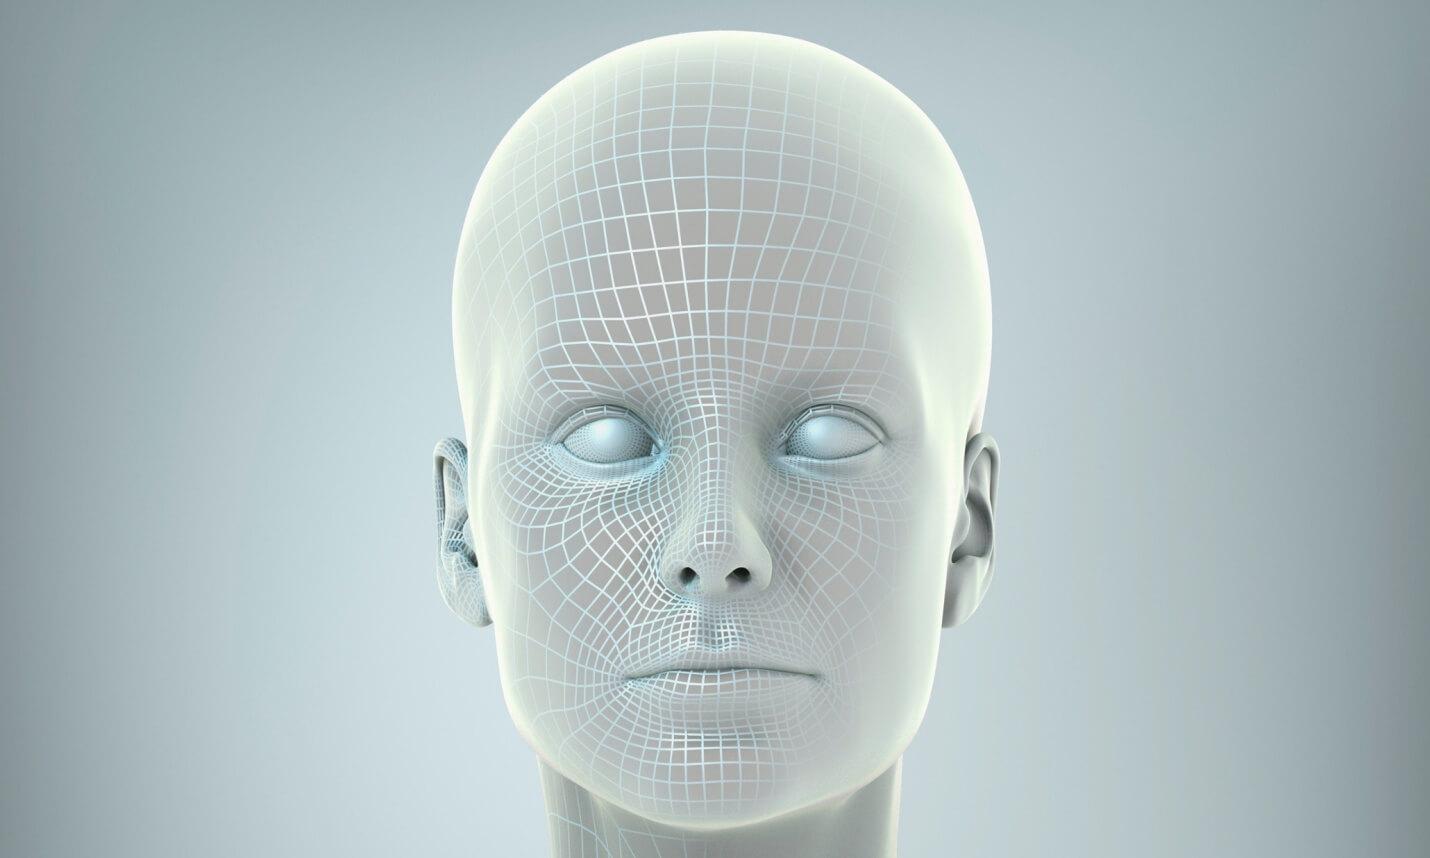 transhumanisme cyborg singularité